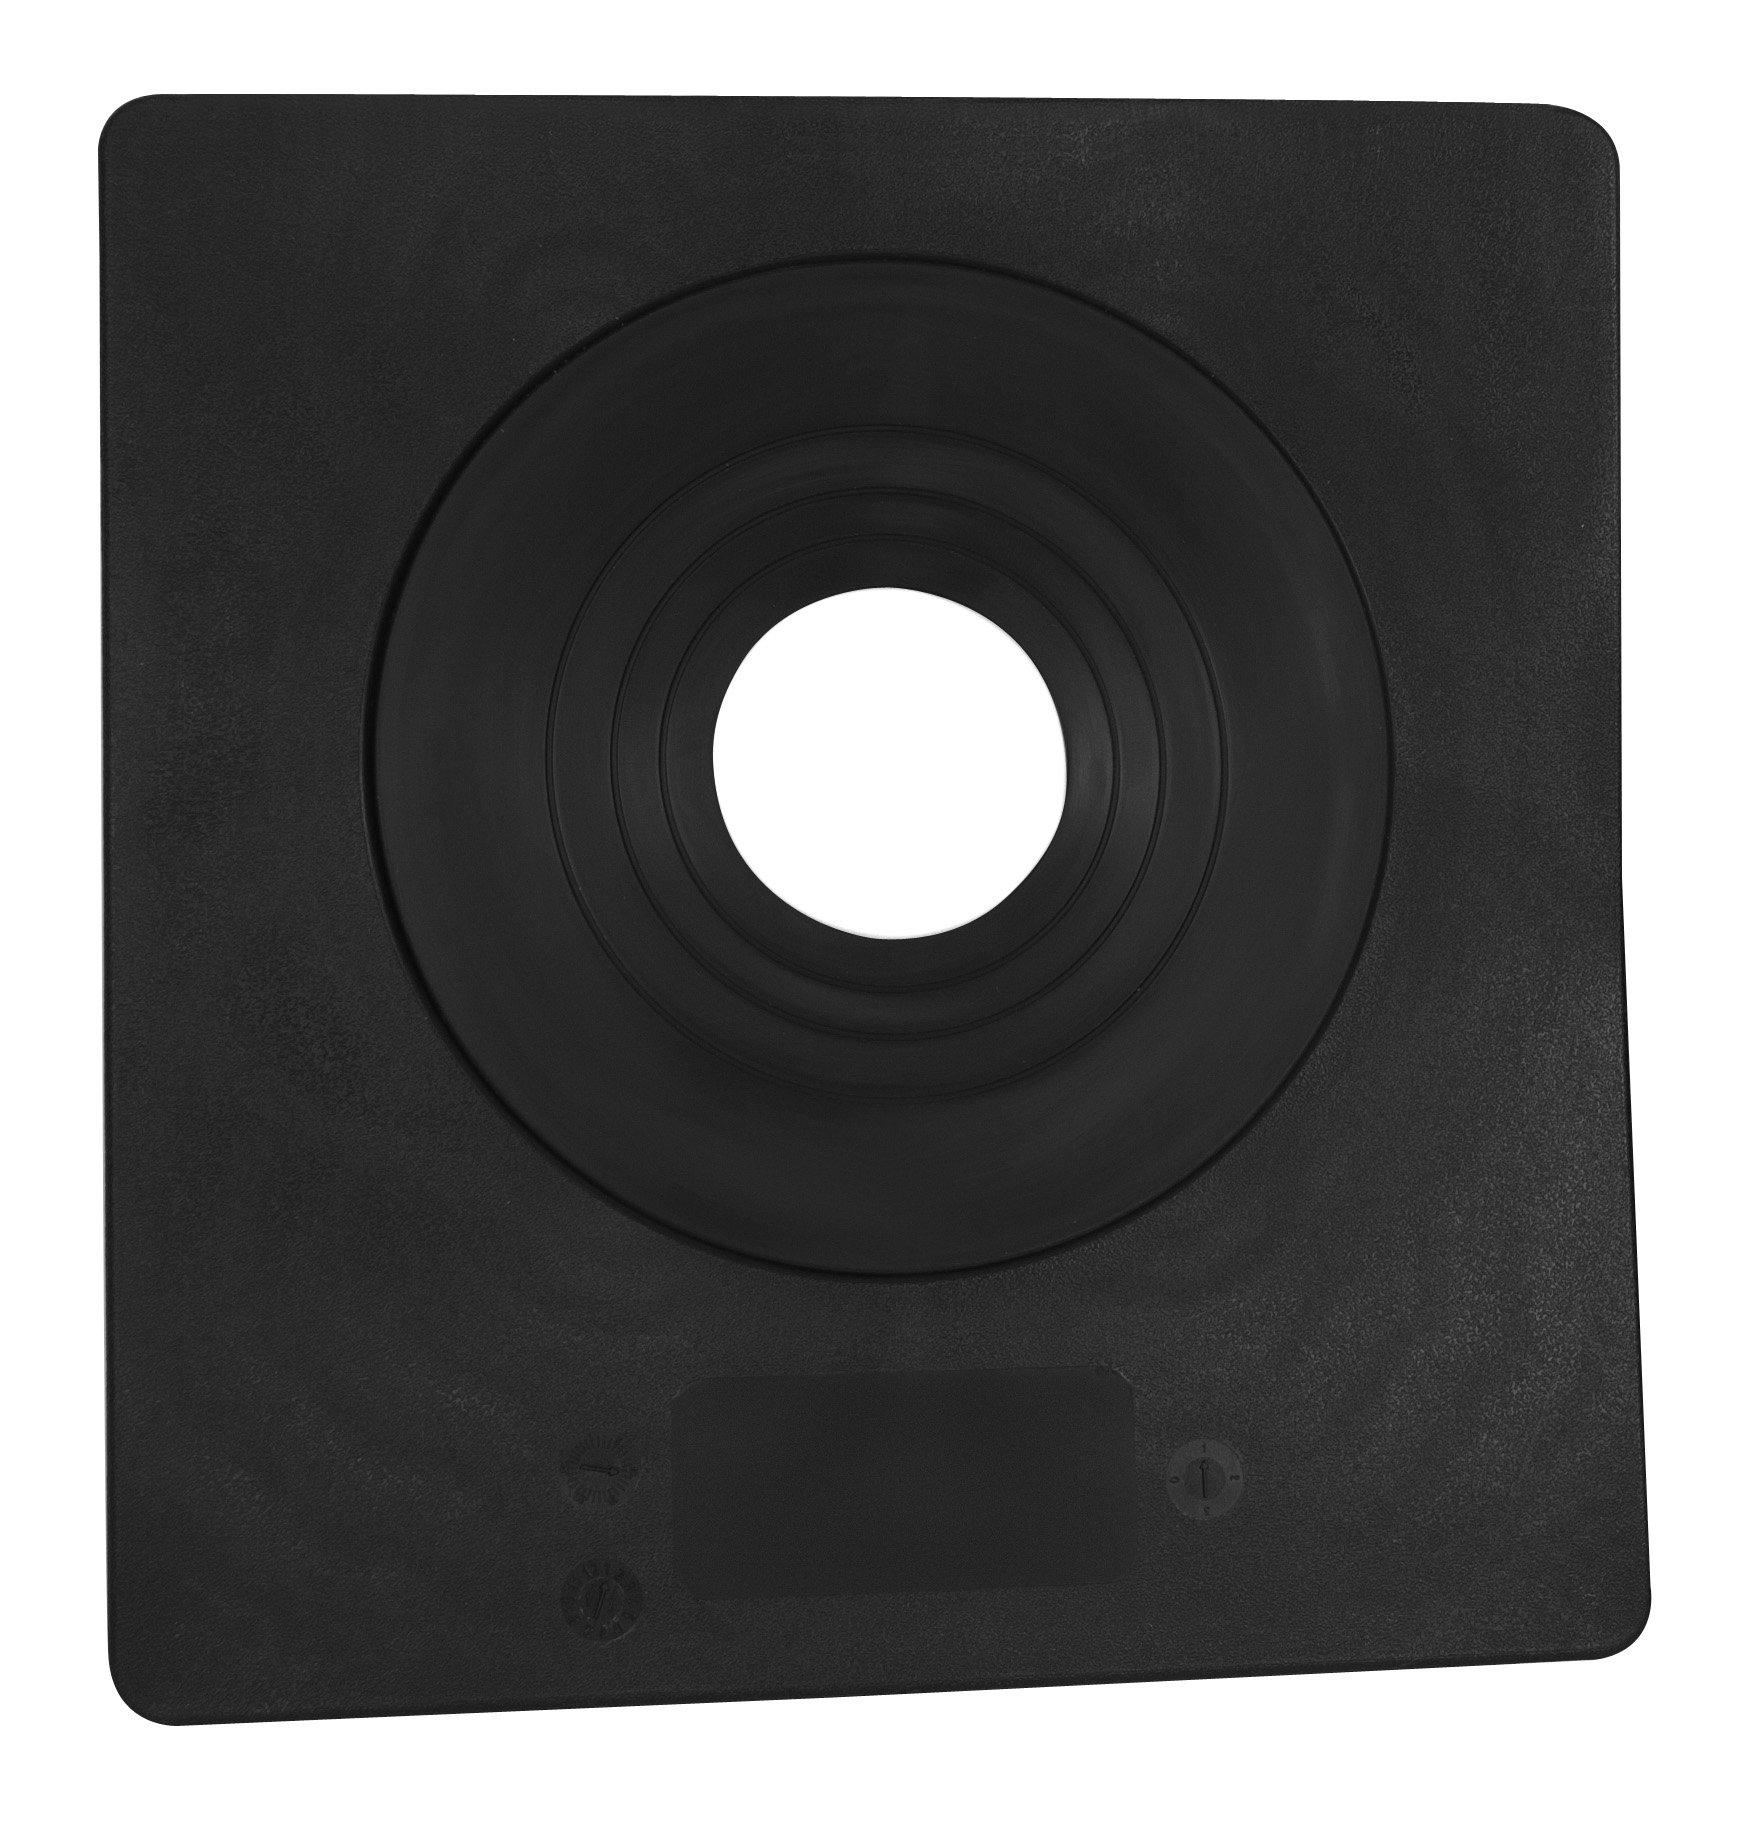 Oatey 12806 Hard Plastic/Elastomeric collar 3''- 6'' pipe diameter Sideflash Vertical Roof Flashing 12'' x 12.5'' Base by Oatey